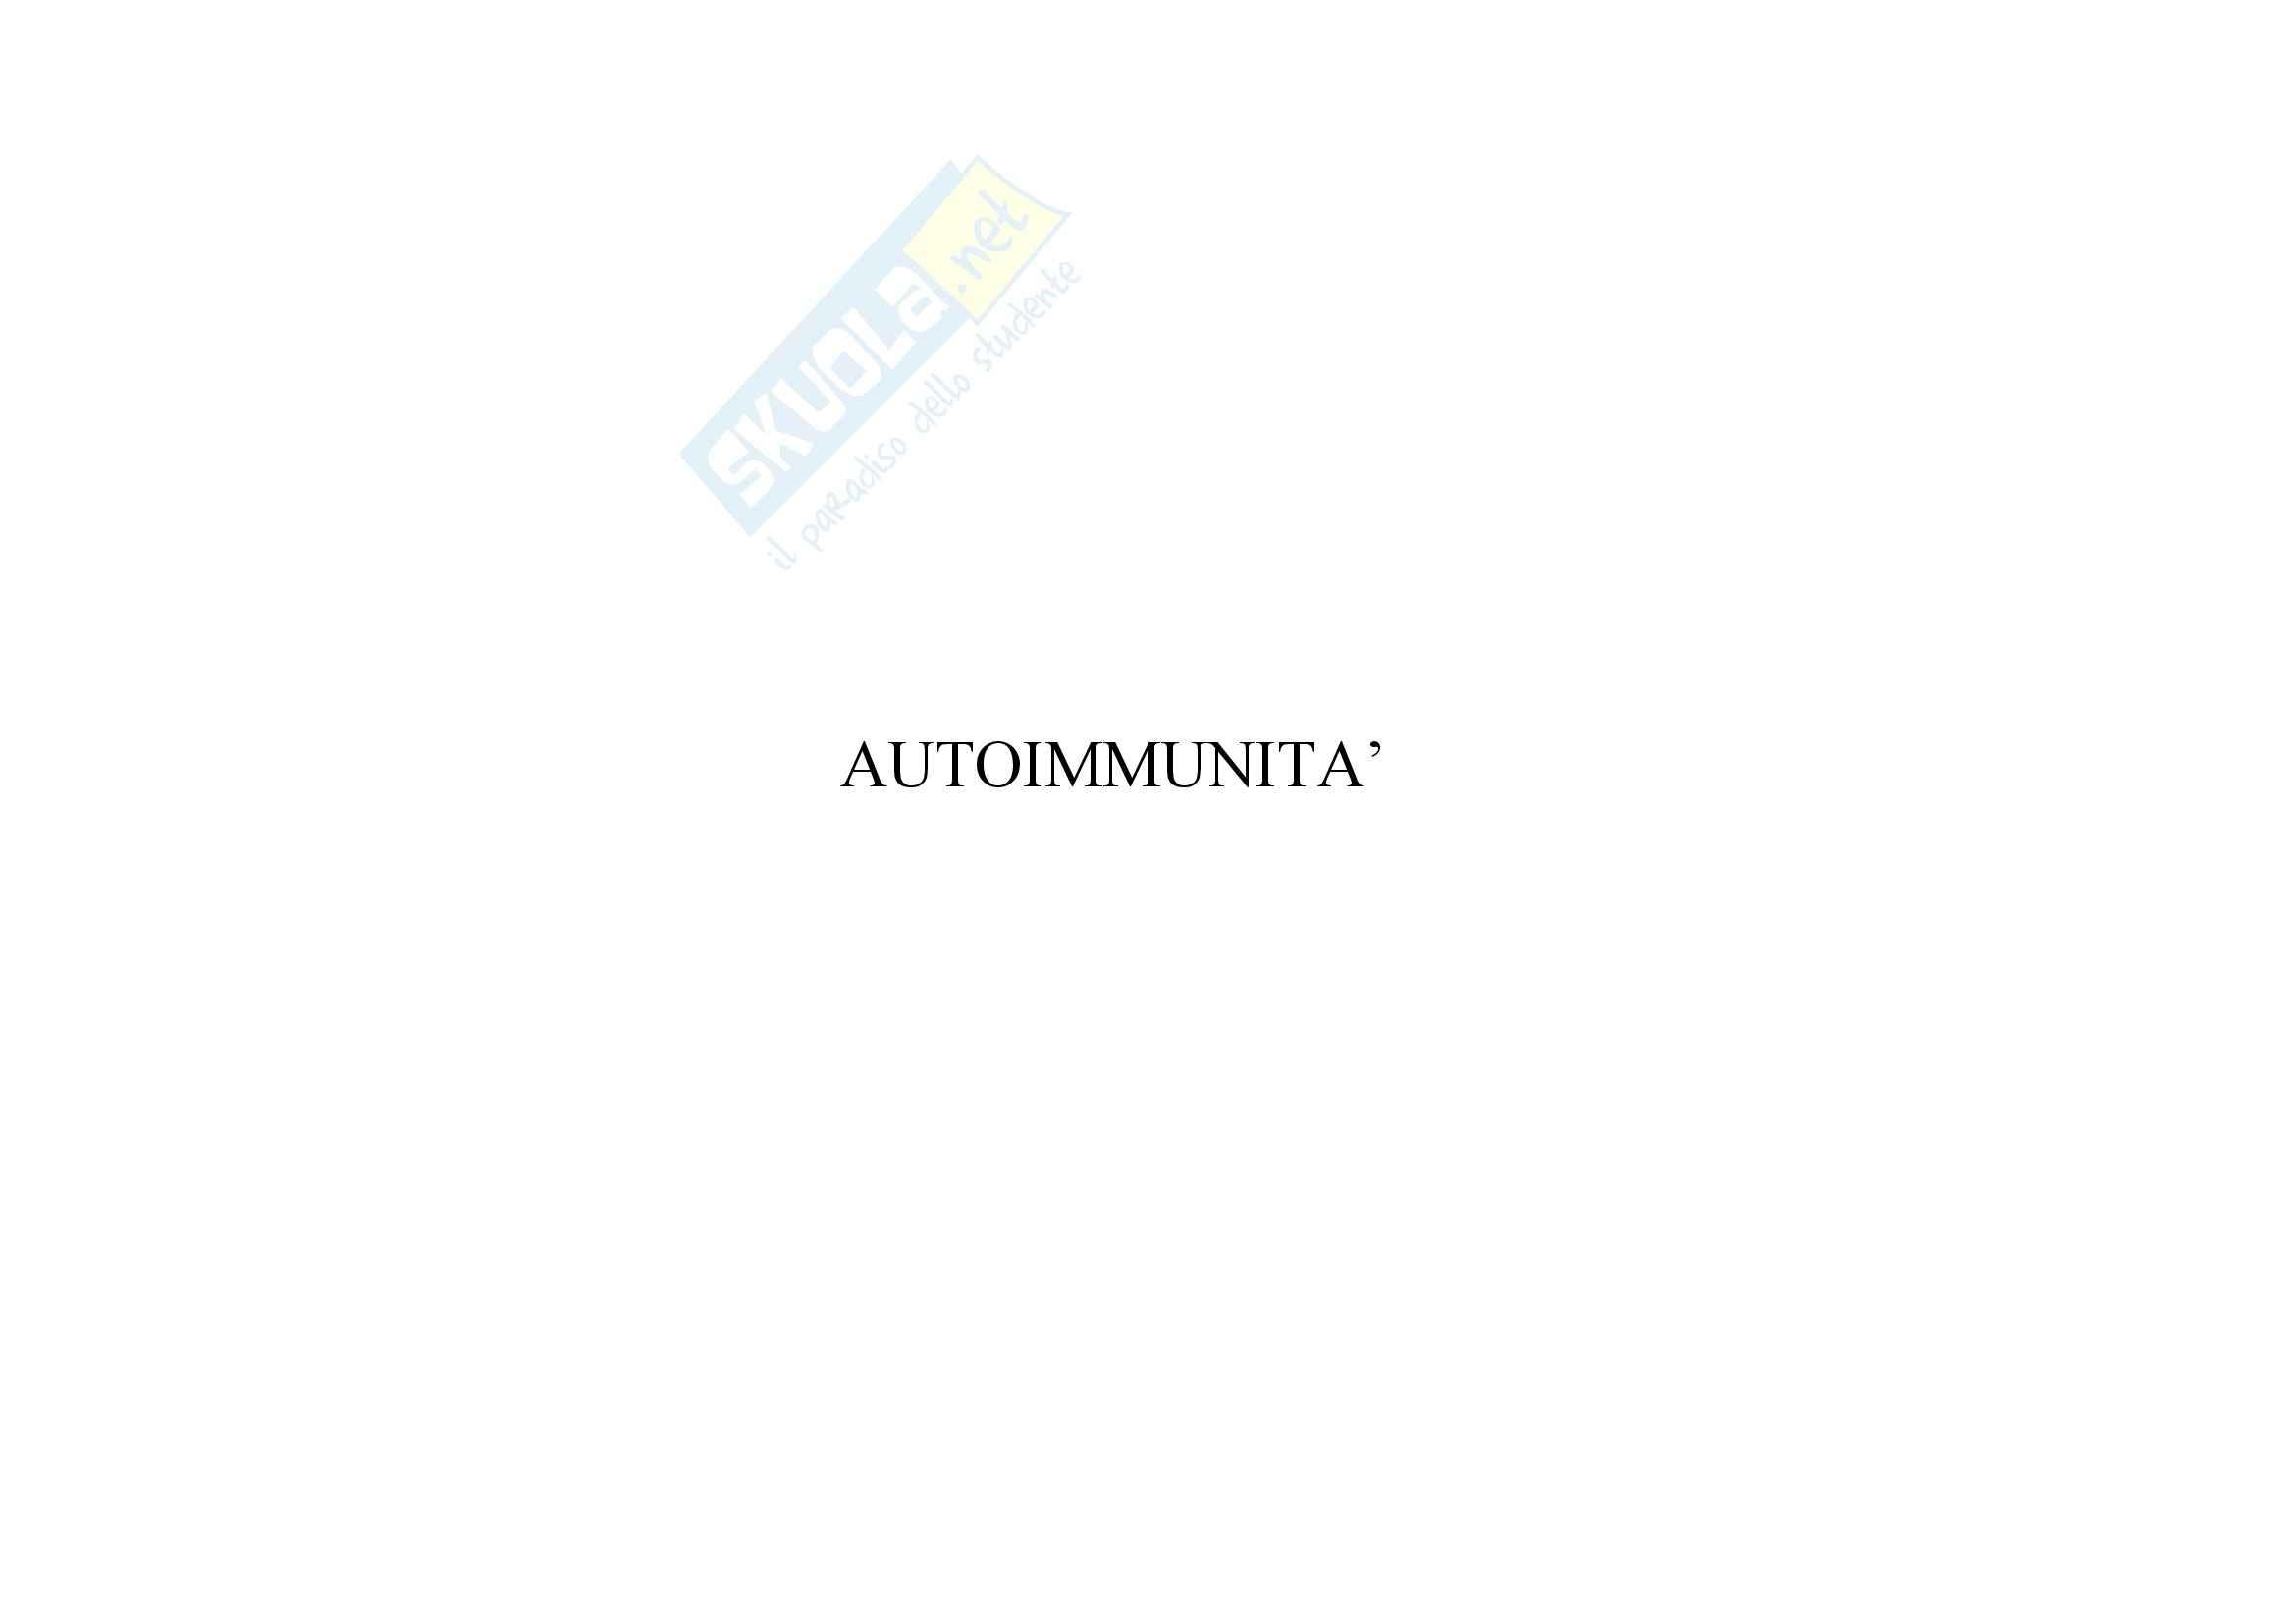 Immunologia - autoimmunità